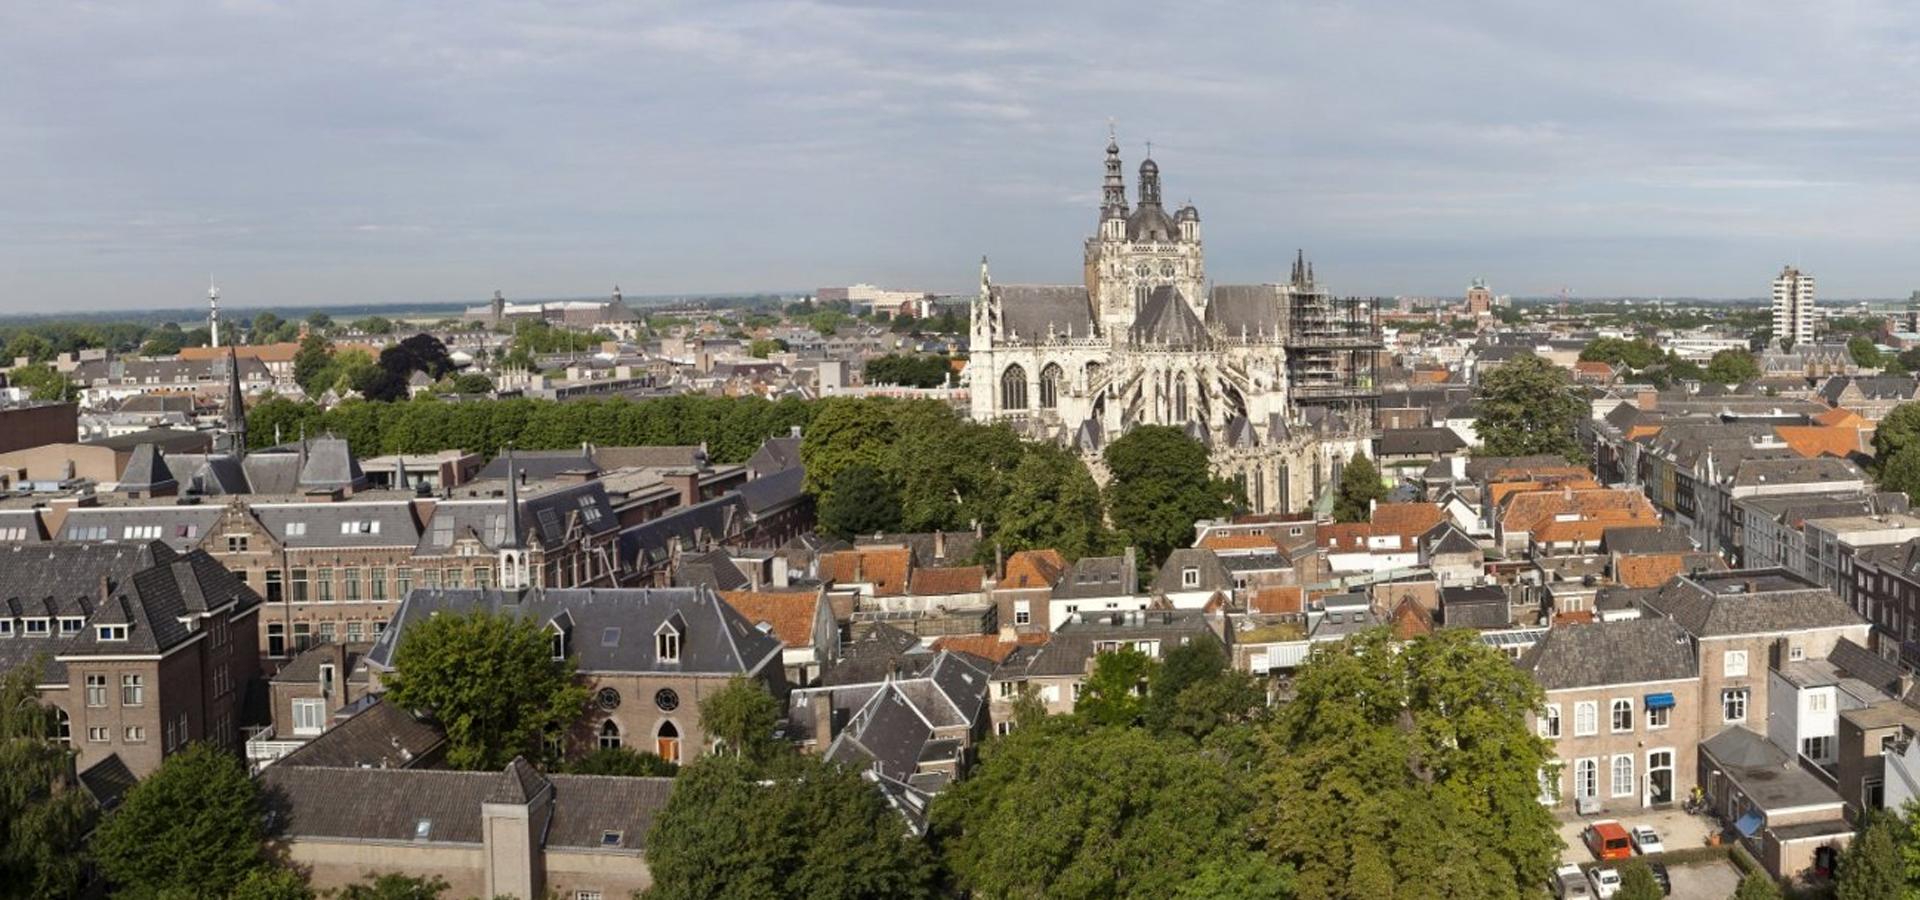 Peer-to-peer advisory in Oude IJsselstreek, North Brabant, Netherlands